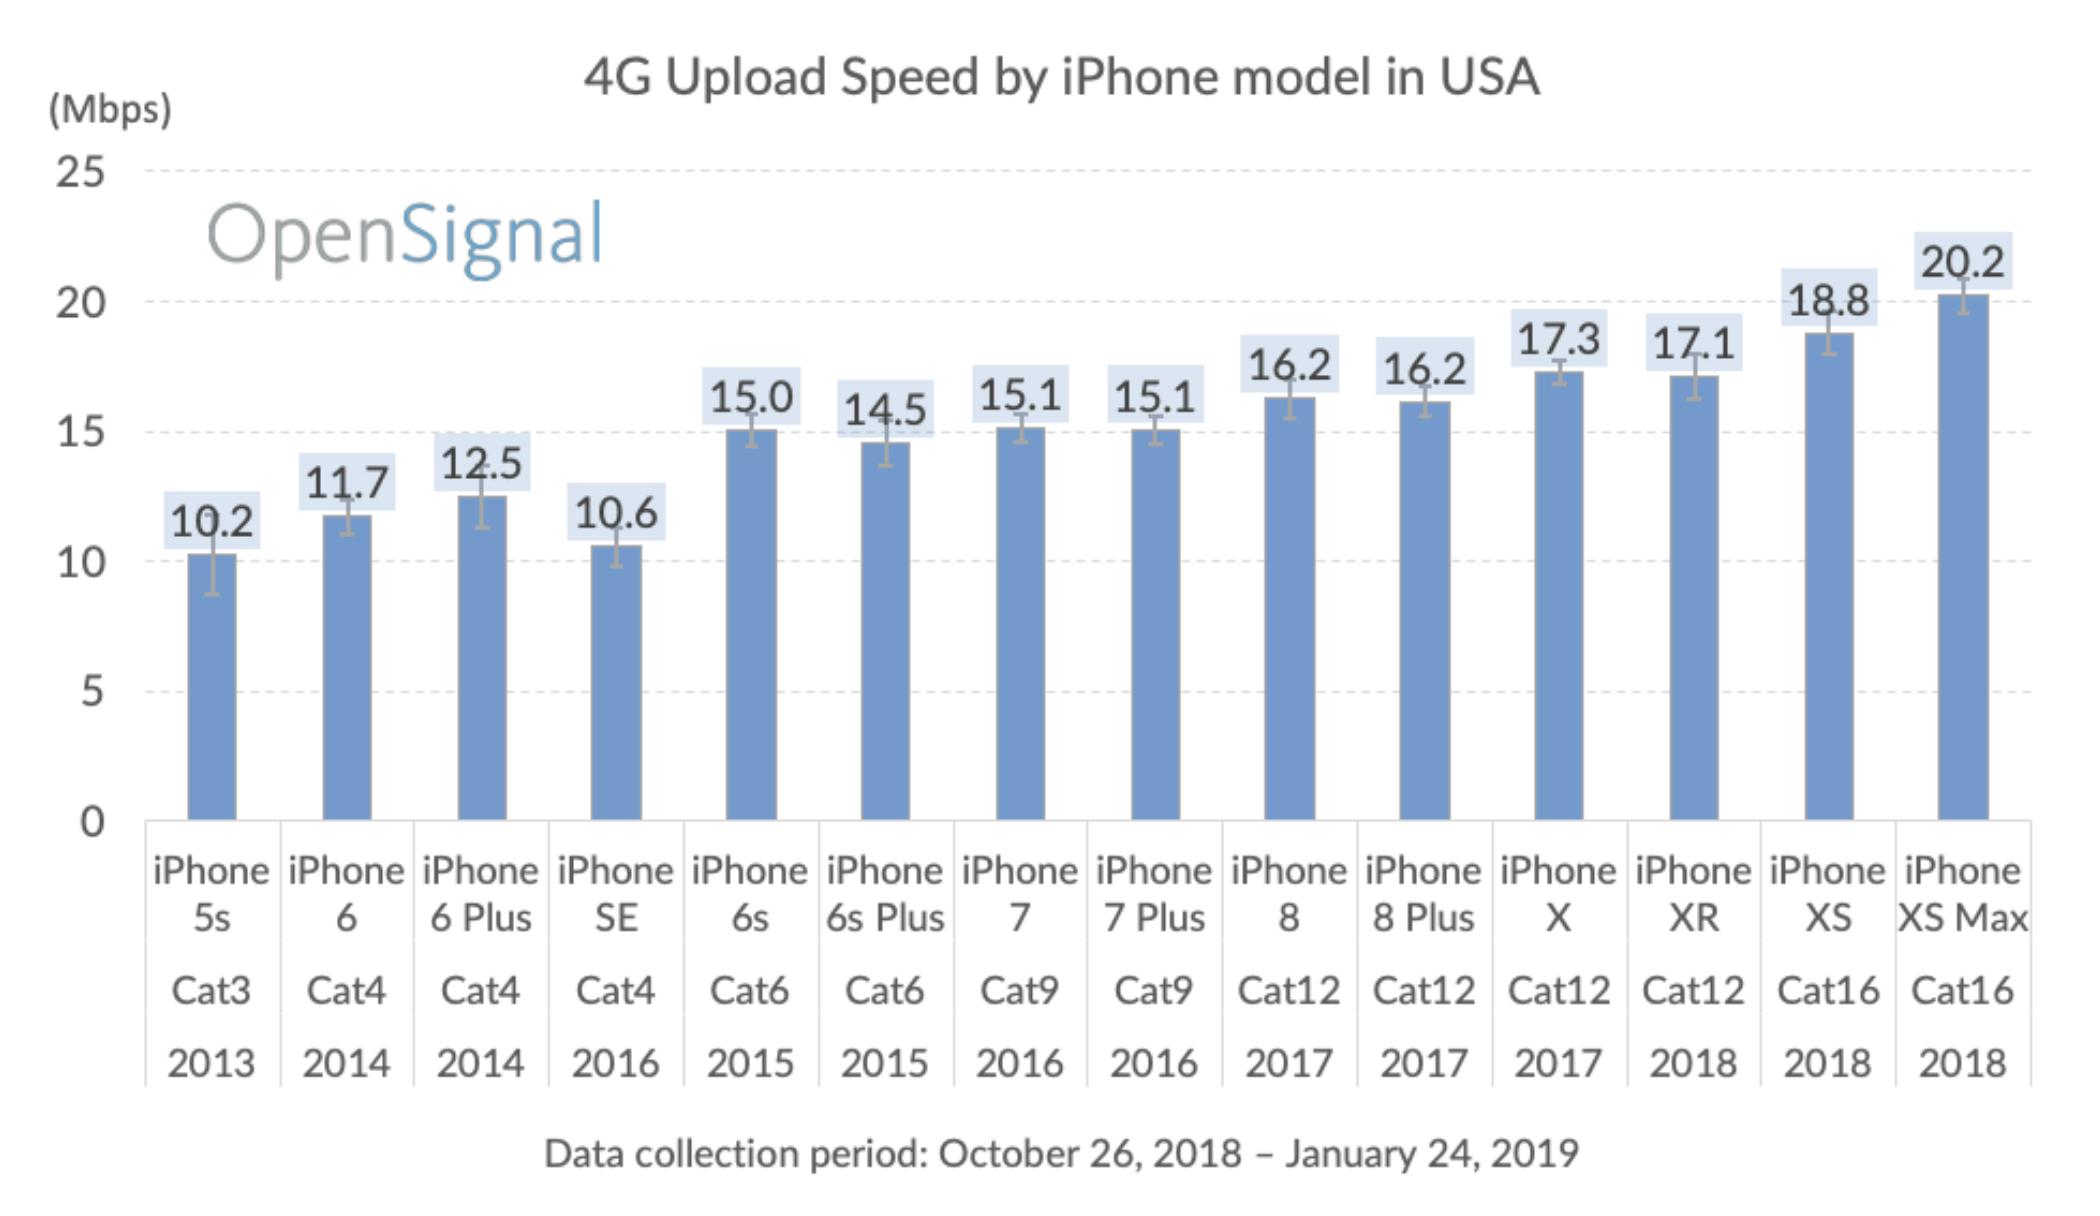 Velocidade de upload 4G/LTE nos iPhones